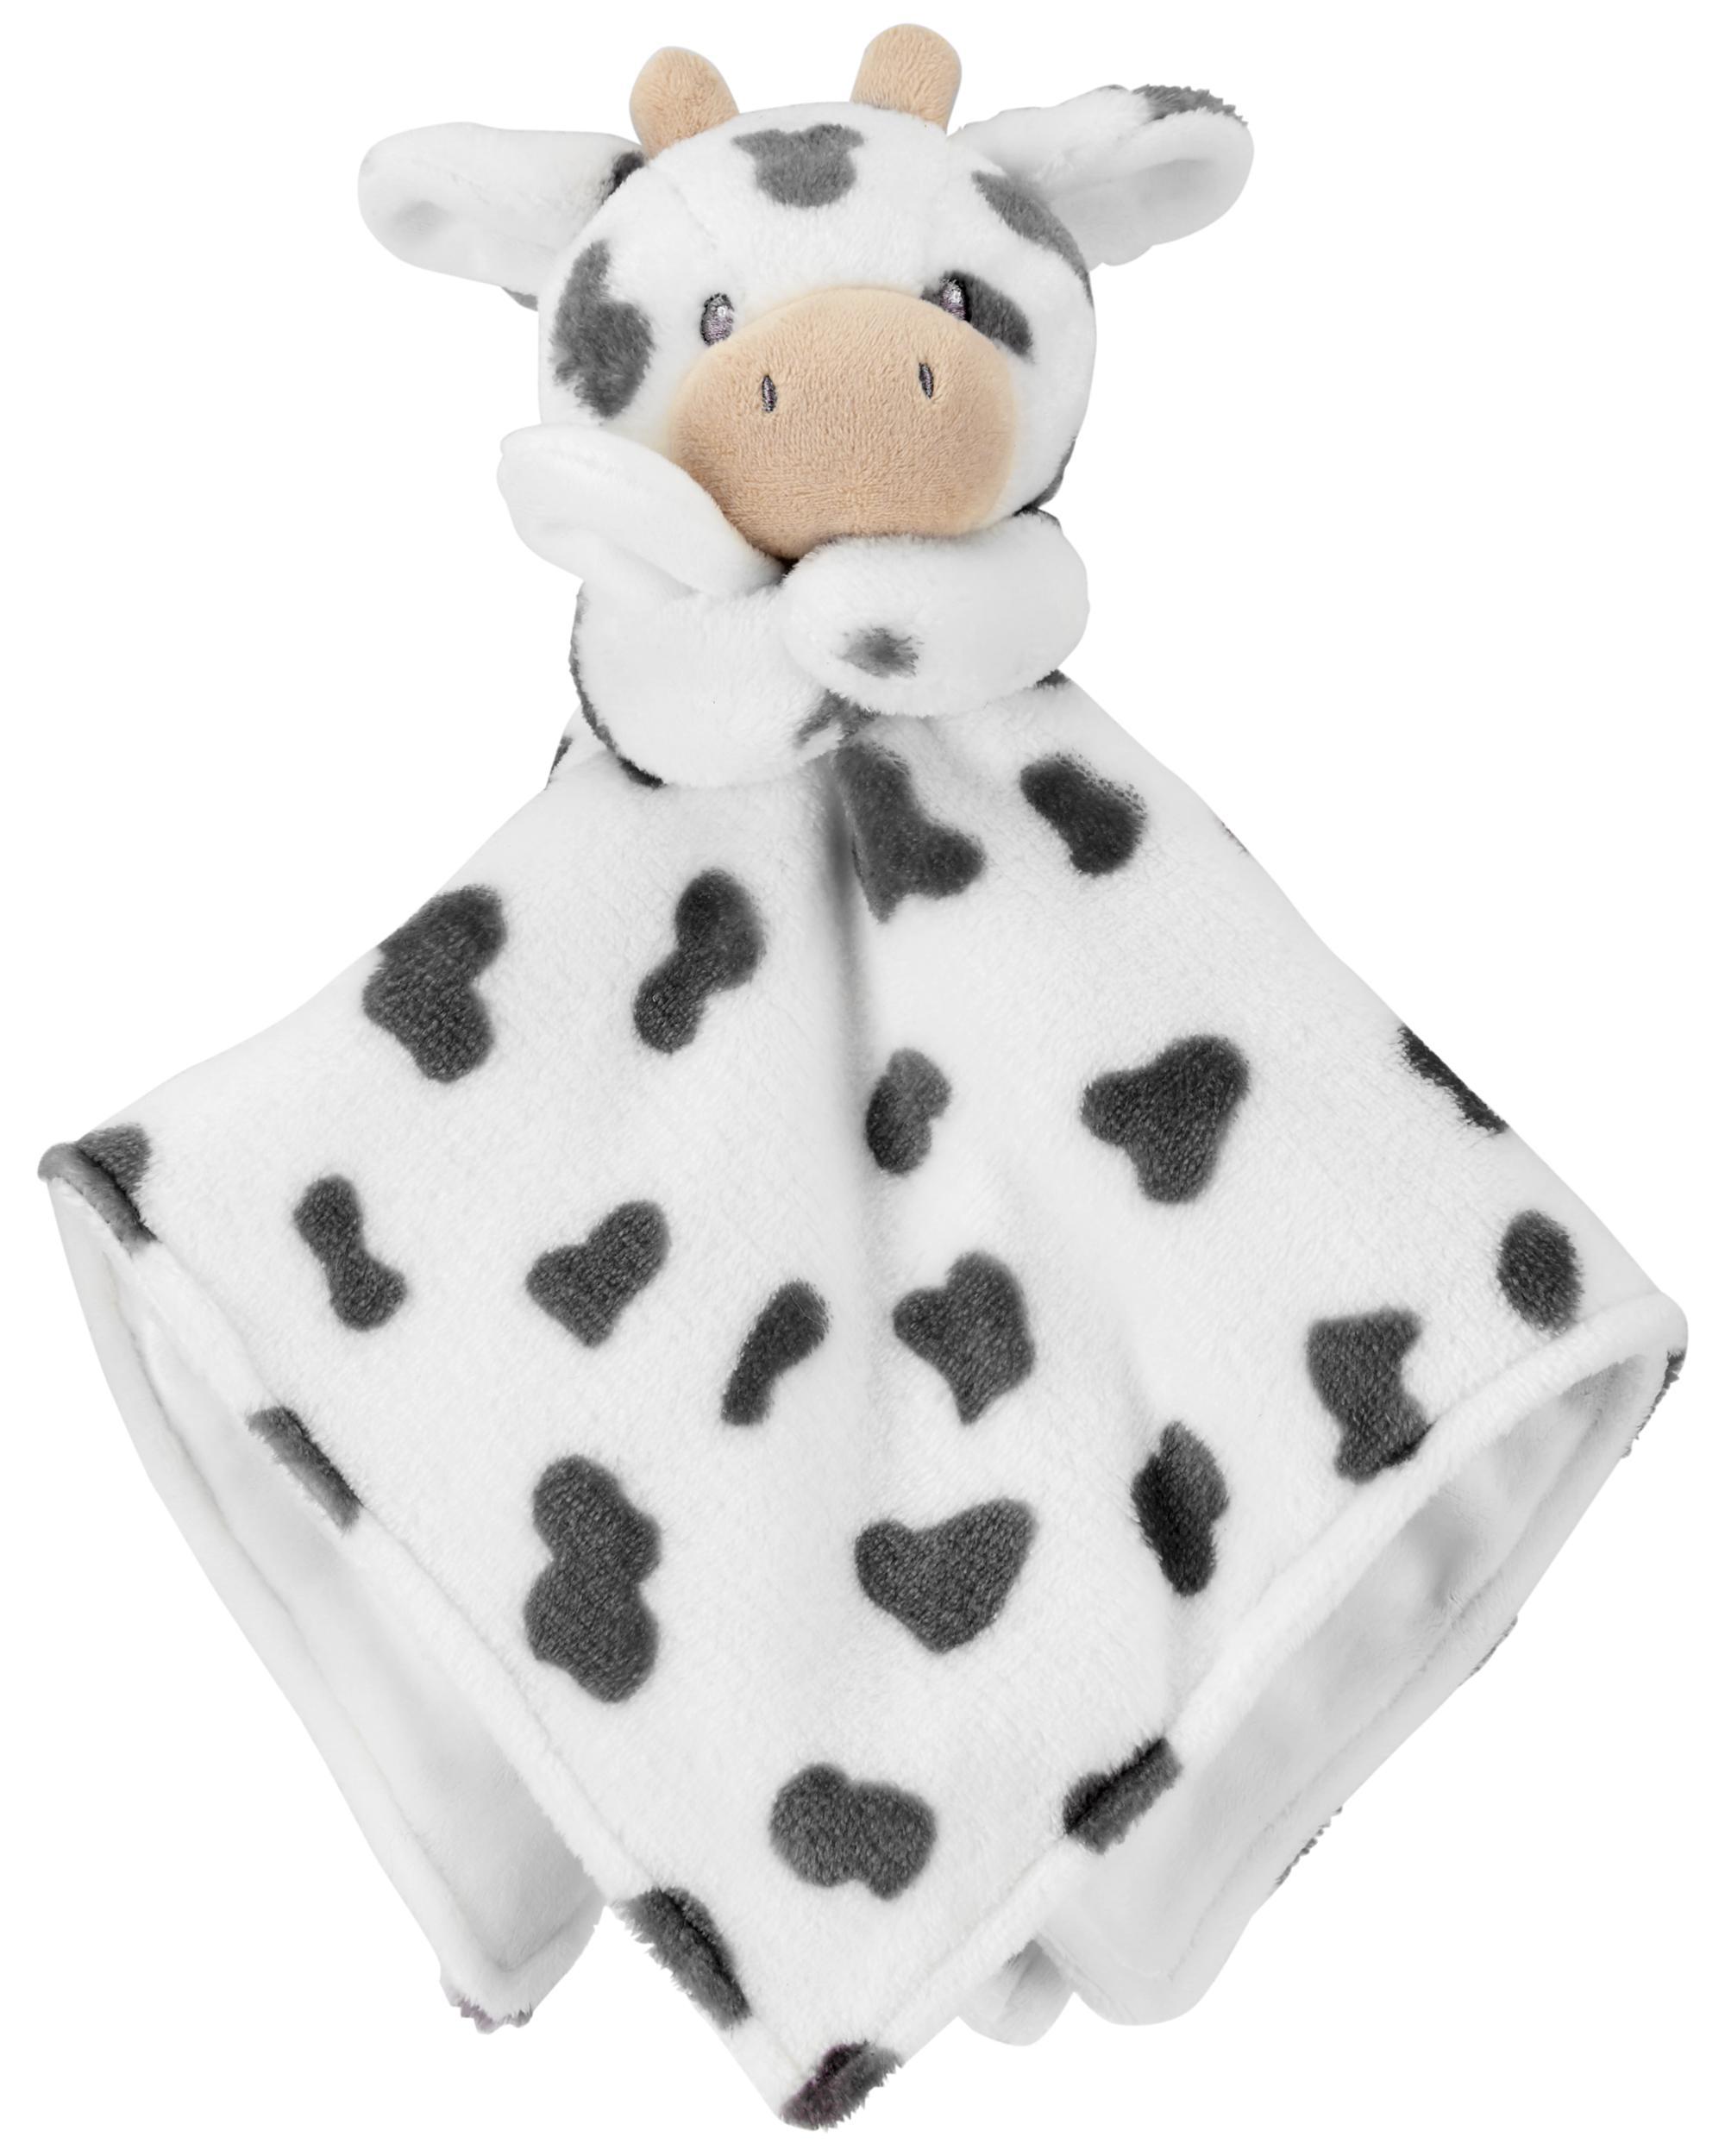 Carters Cow Security Blanket